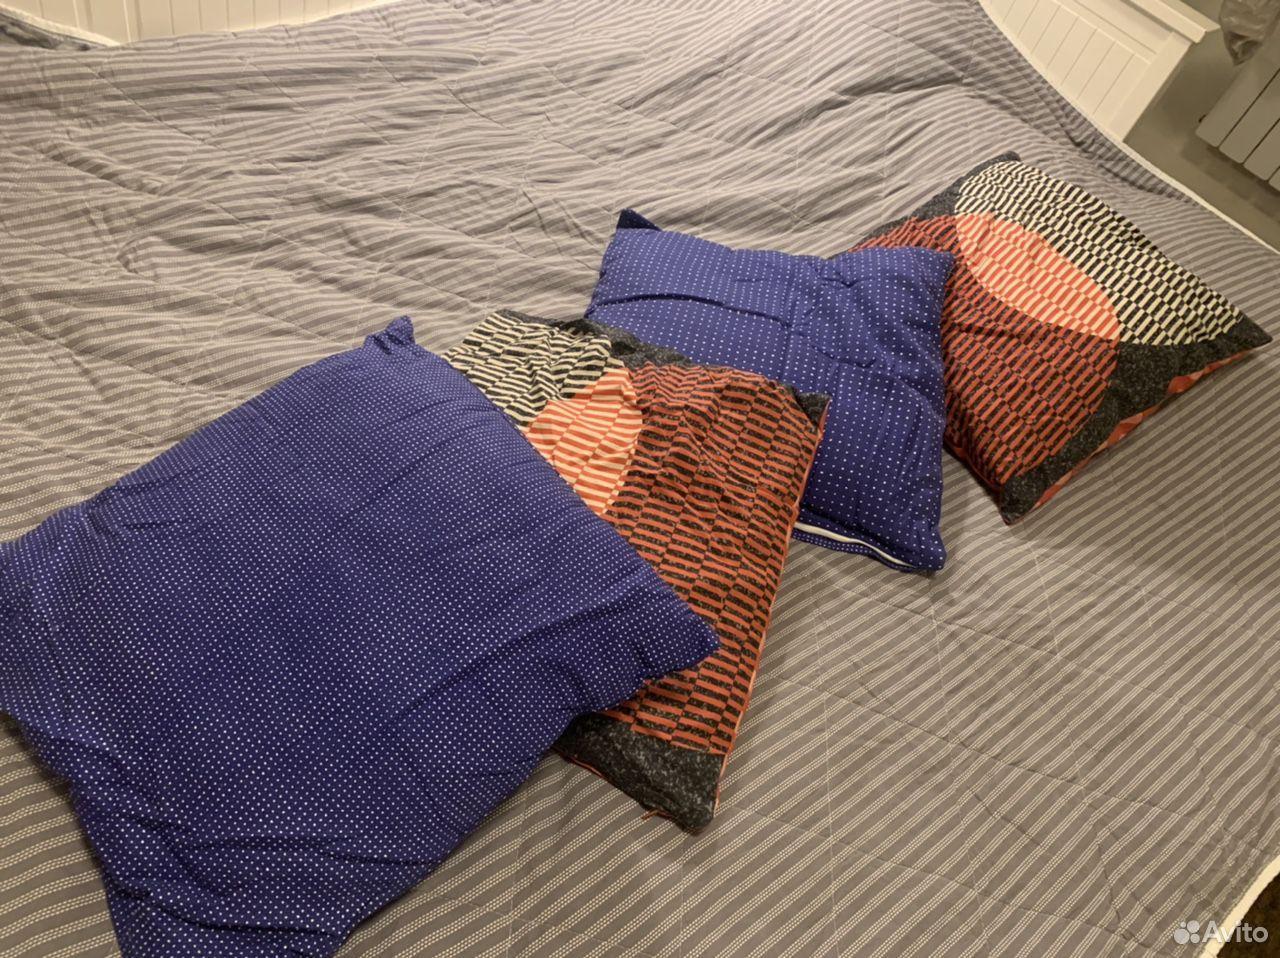 Подушки и наволочки IKEA  89650062504 купить 1